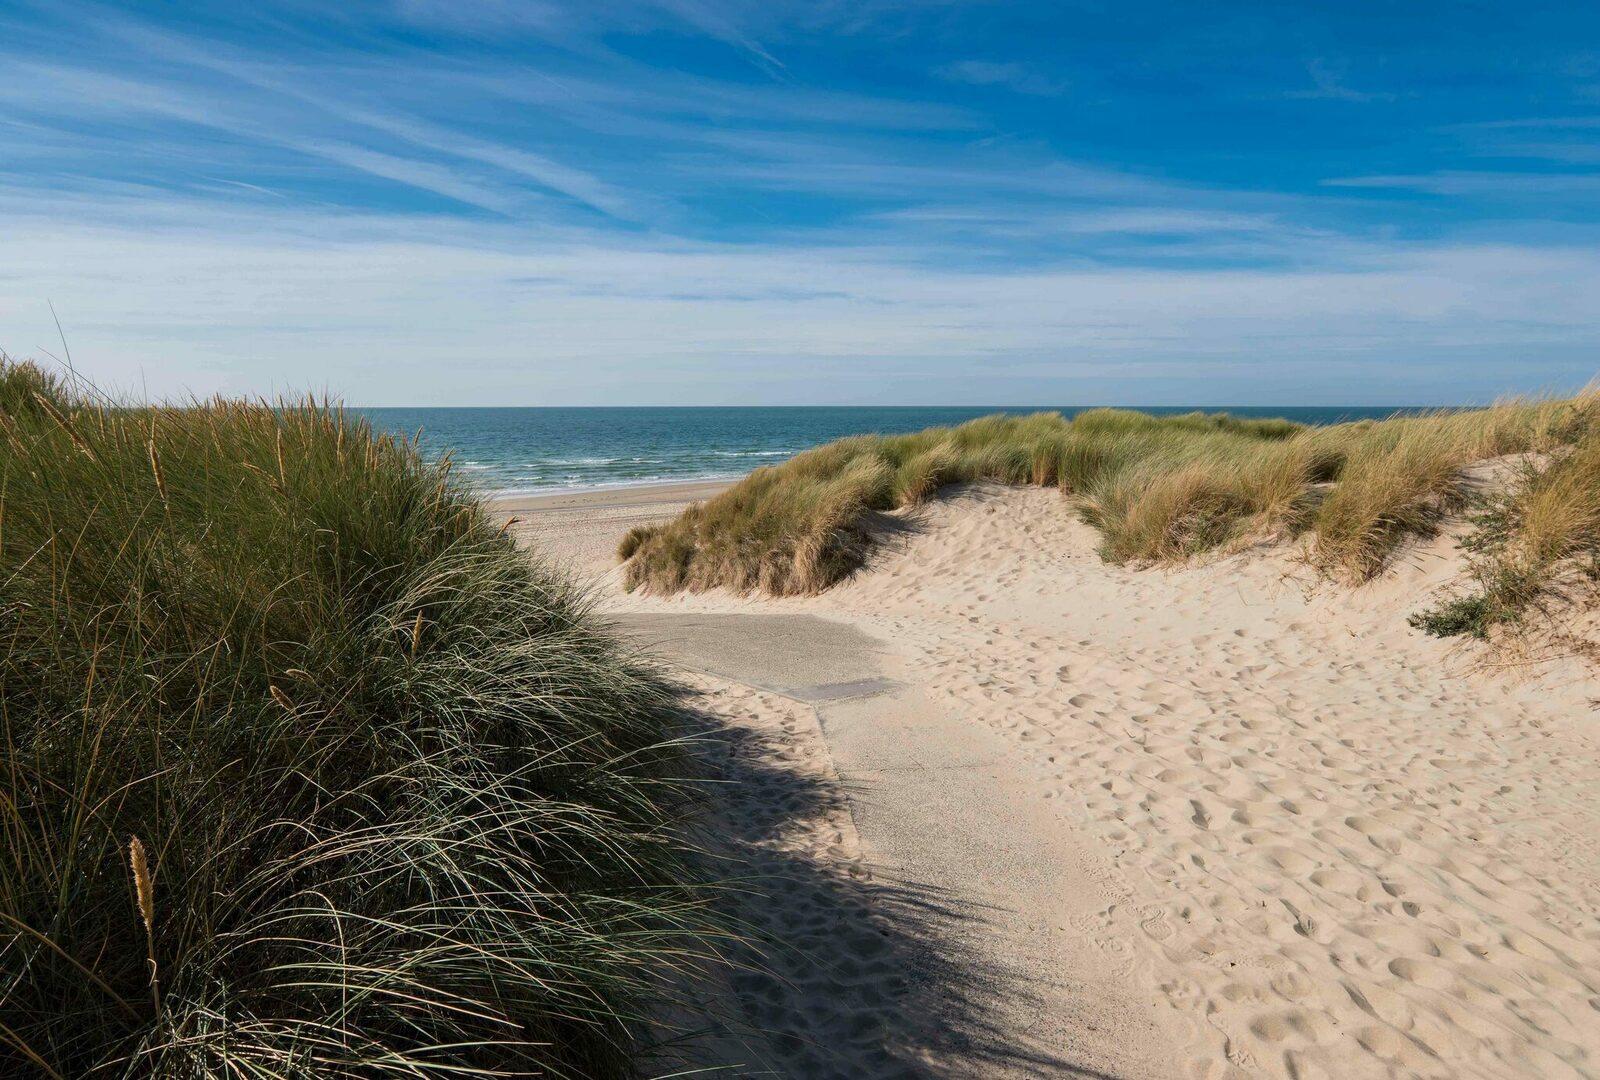 Beach house seaside 6p